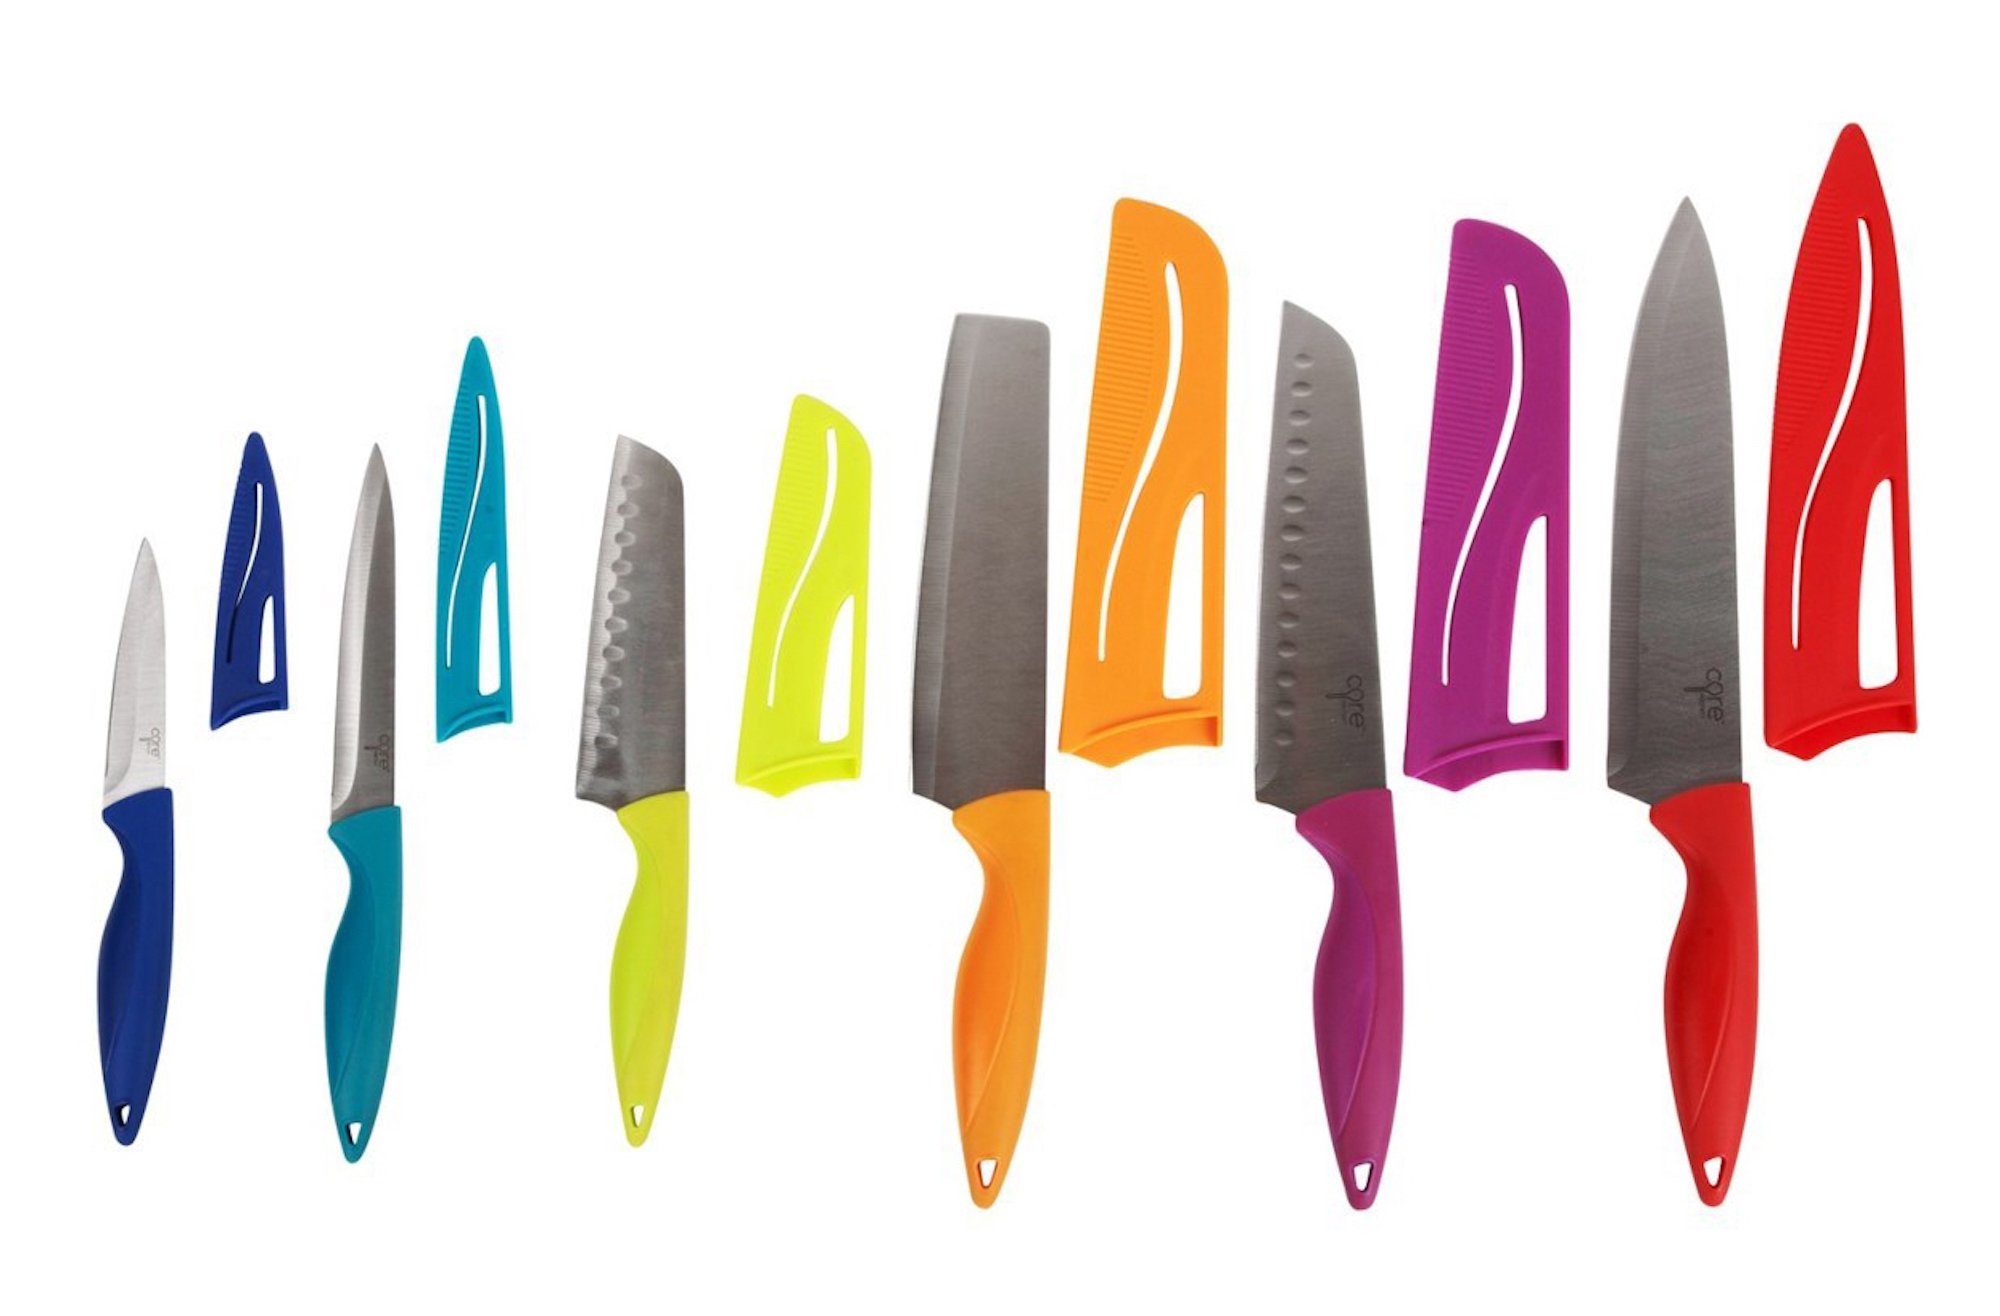 Core Home 6 Knives with Sheaths, Chef/Nakiri/Santoku/Utility/Paring